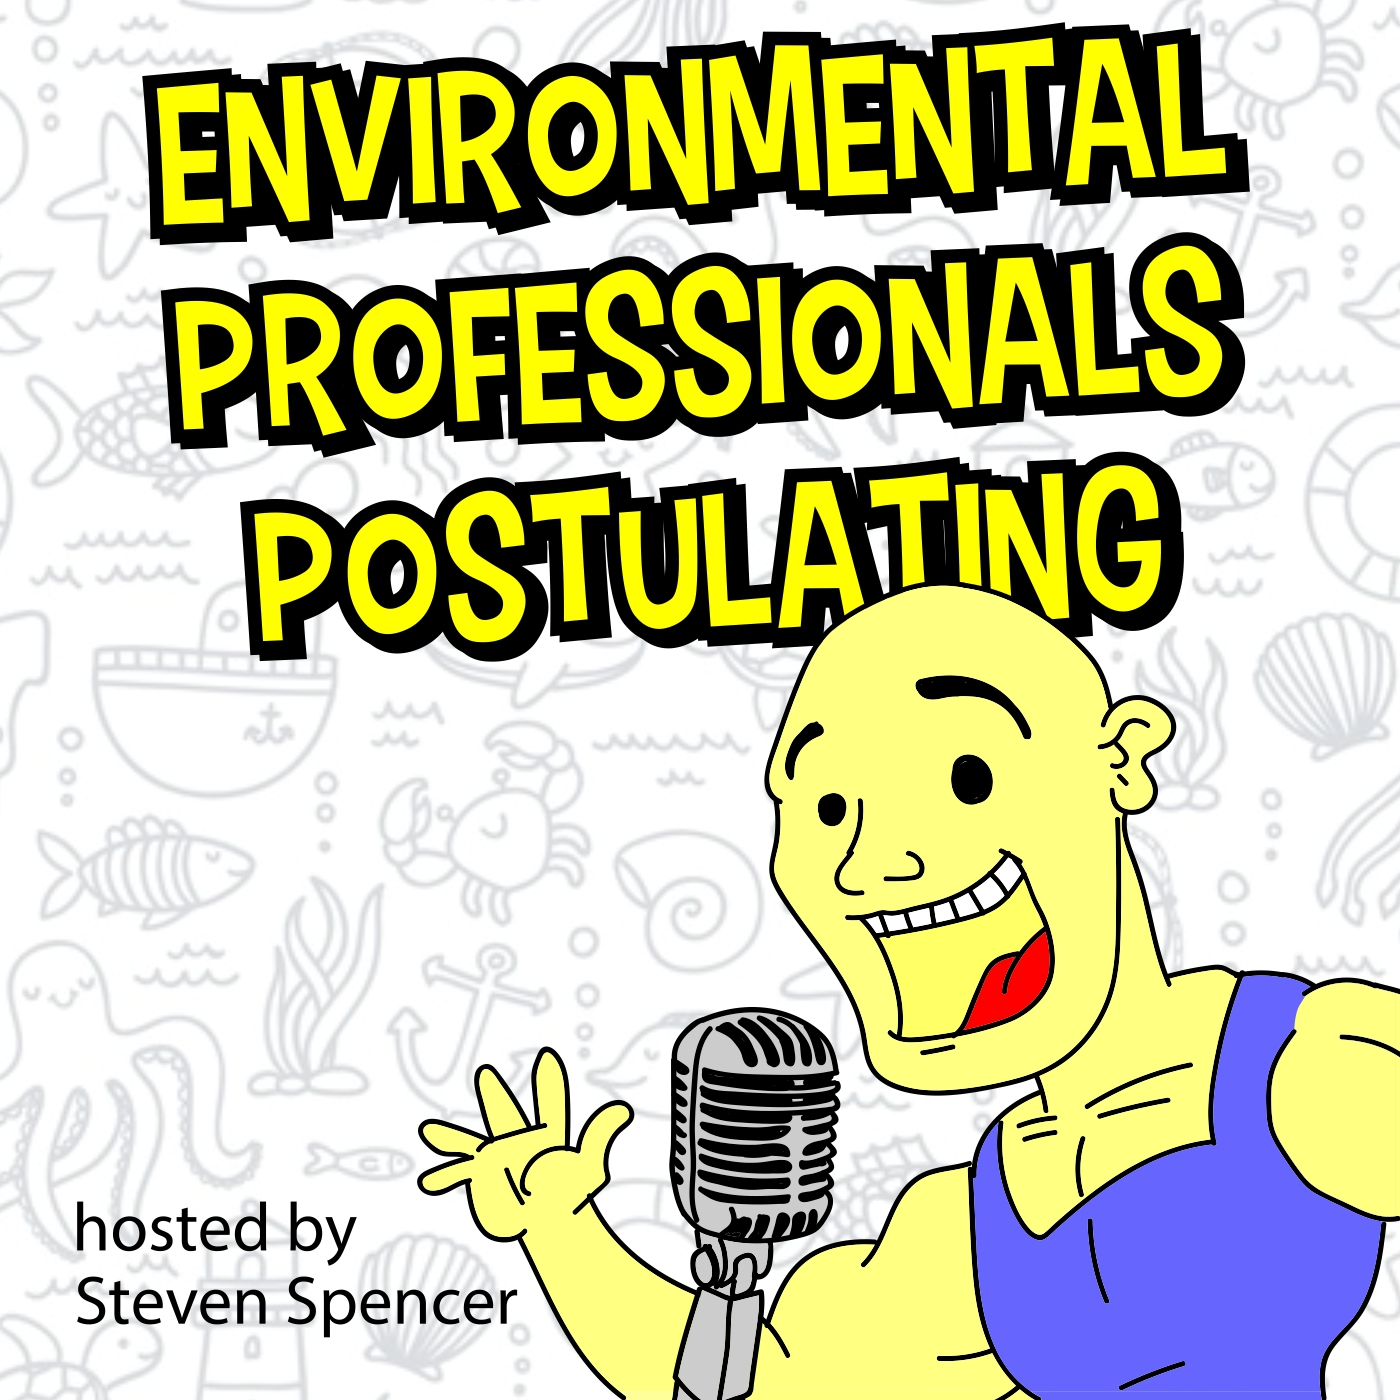 Environmental Professionals Postulating